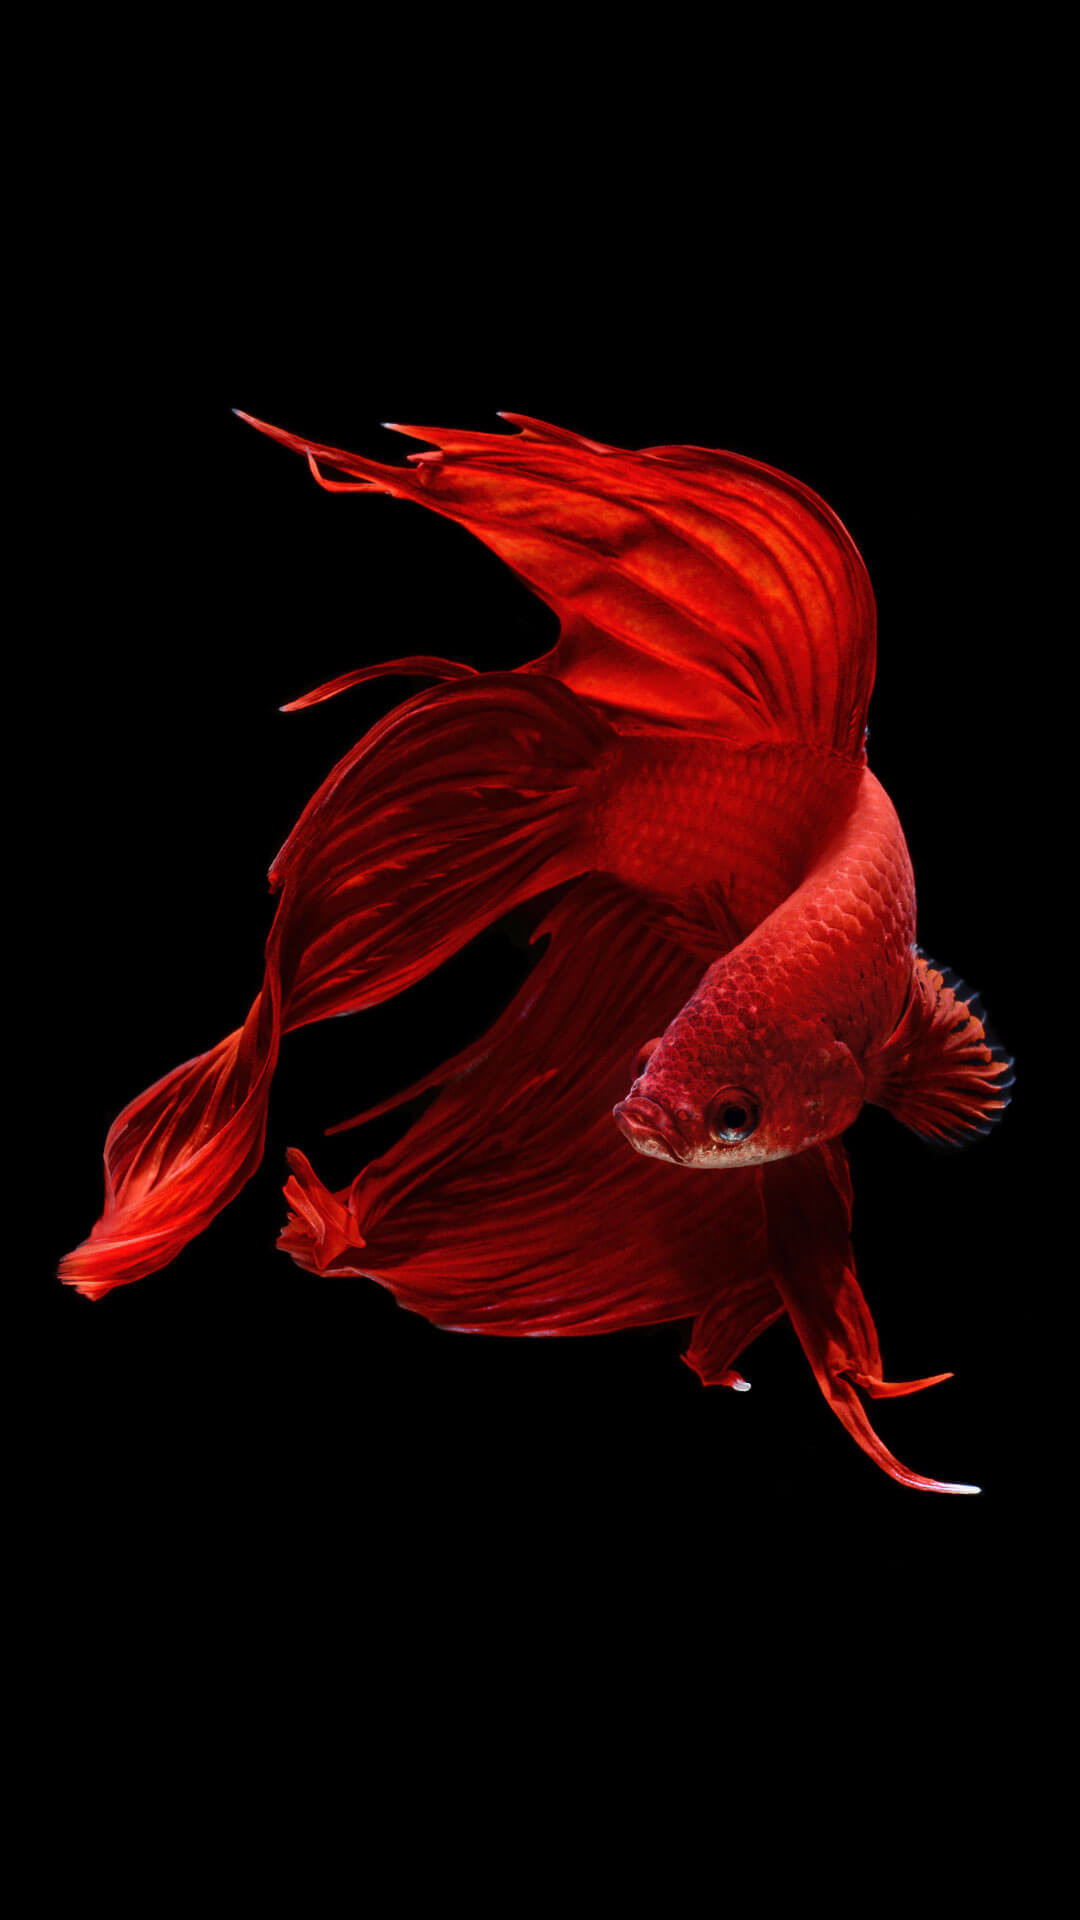 1080x1920 Betta Fish IPhone 6 And 6s Wallpaper HD